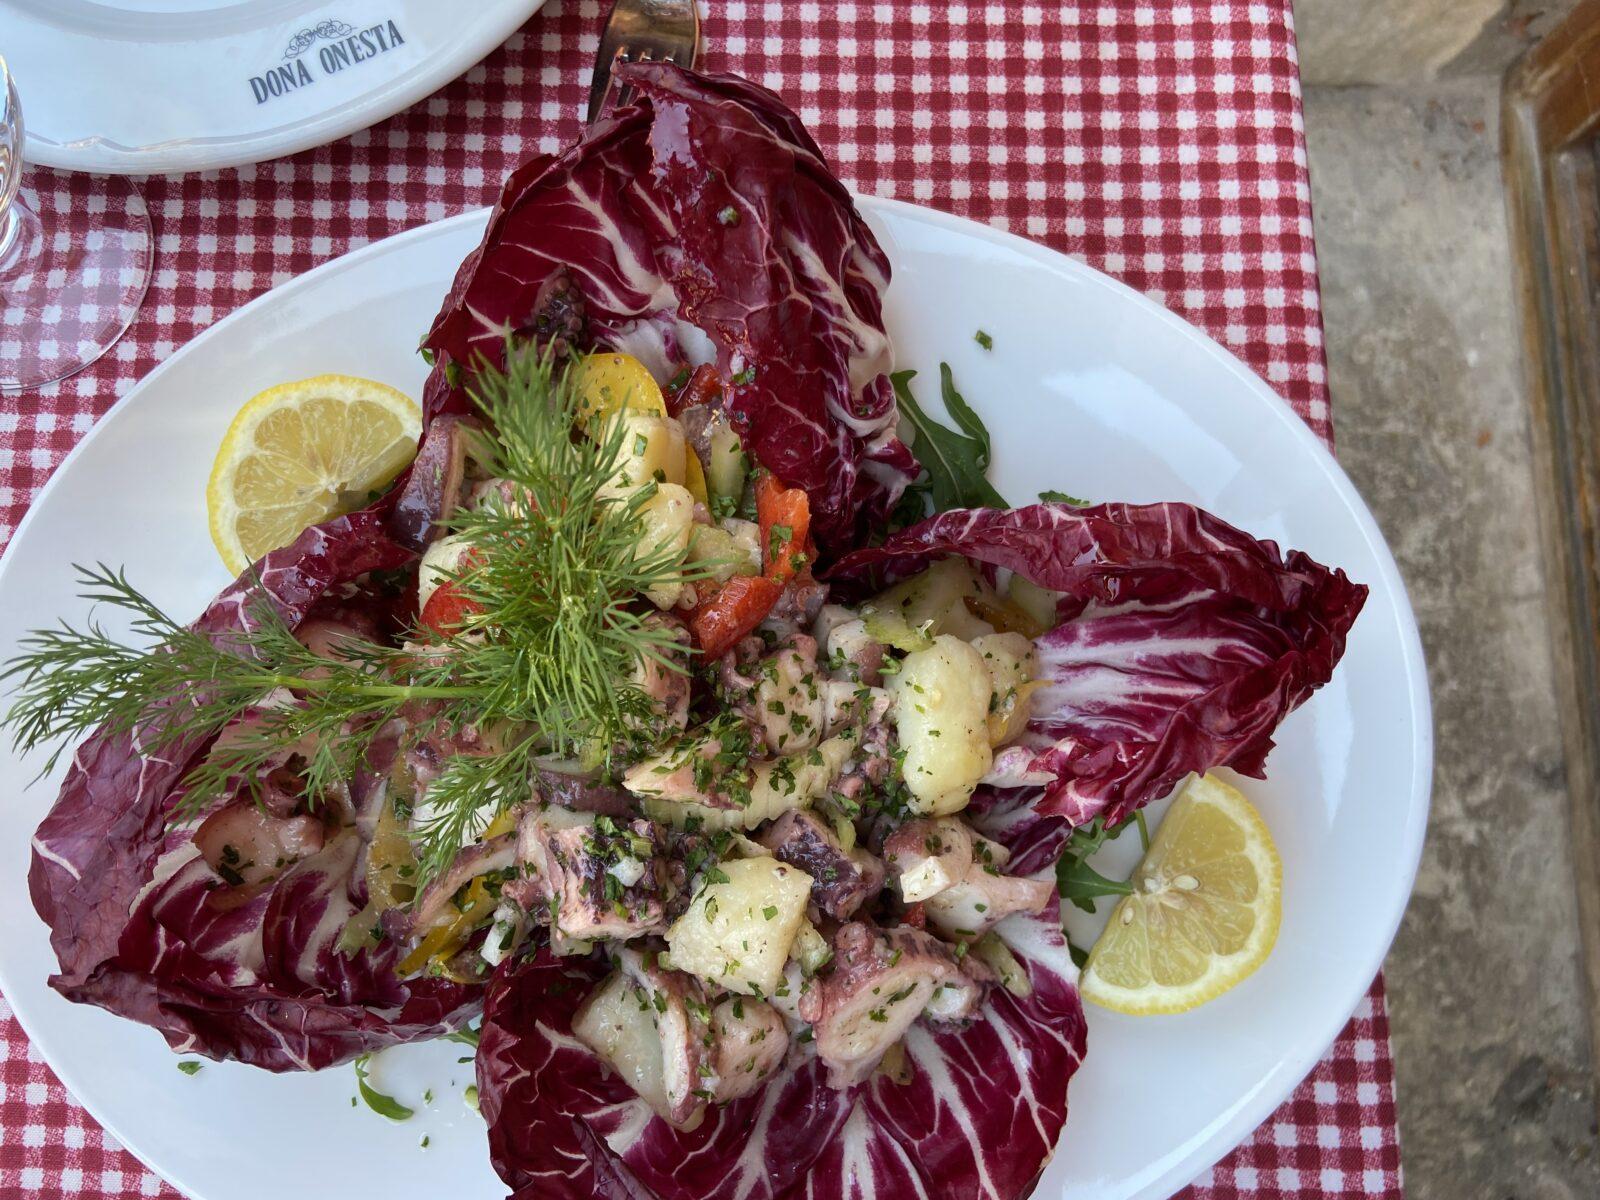 Octopus salad at Trattoria al Gazzettino.